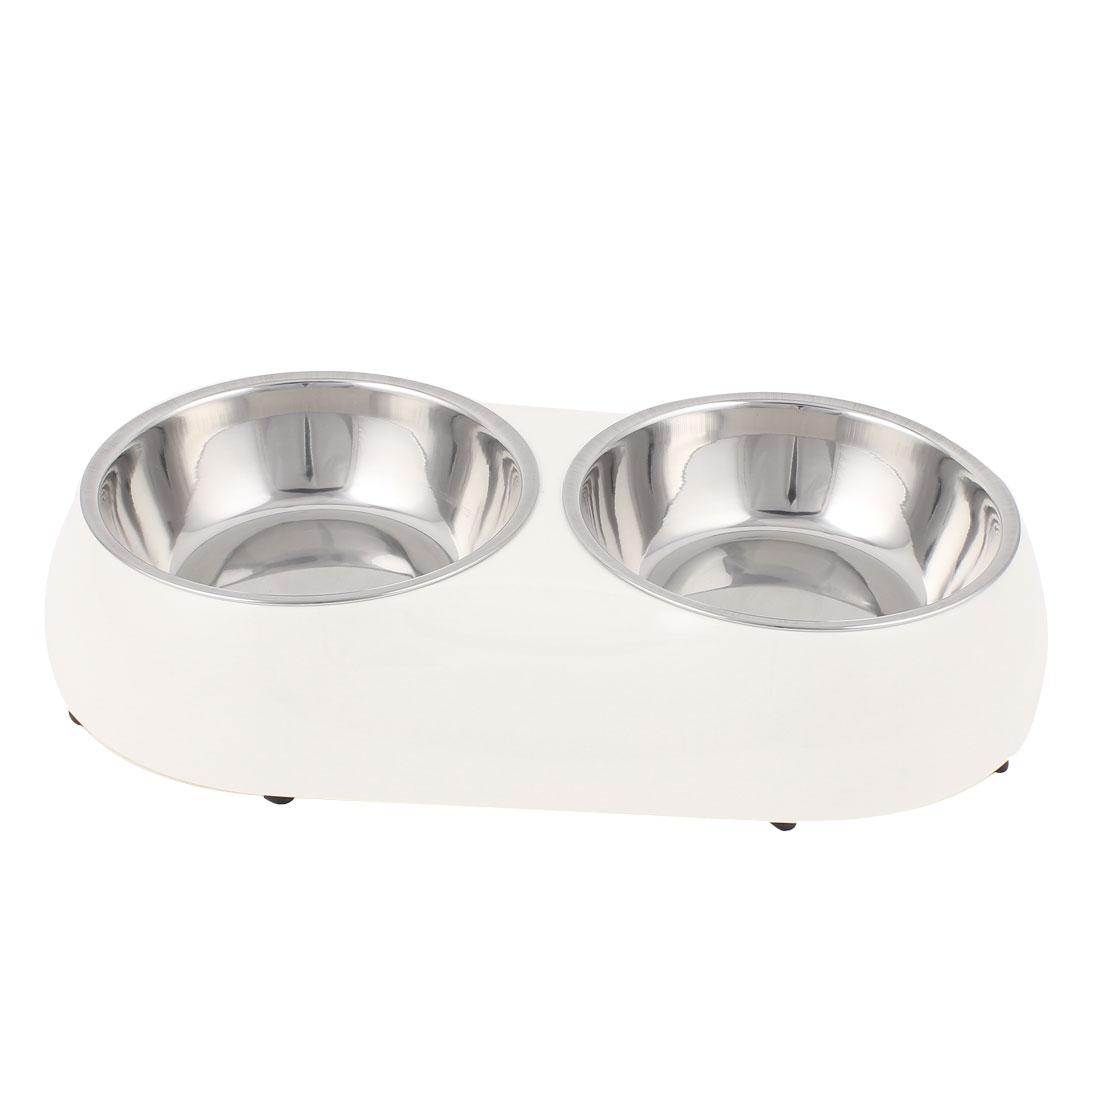 Pet Dog Puppy Plastic Dish Food Water Feeding Feeder Double Bowl White